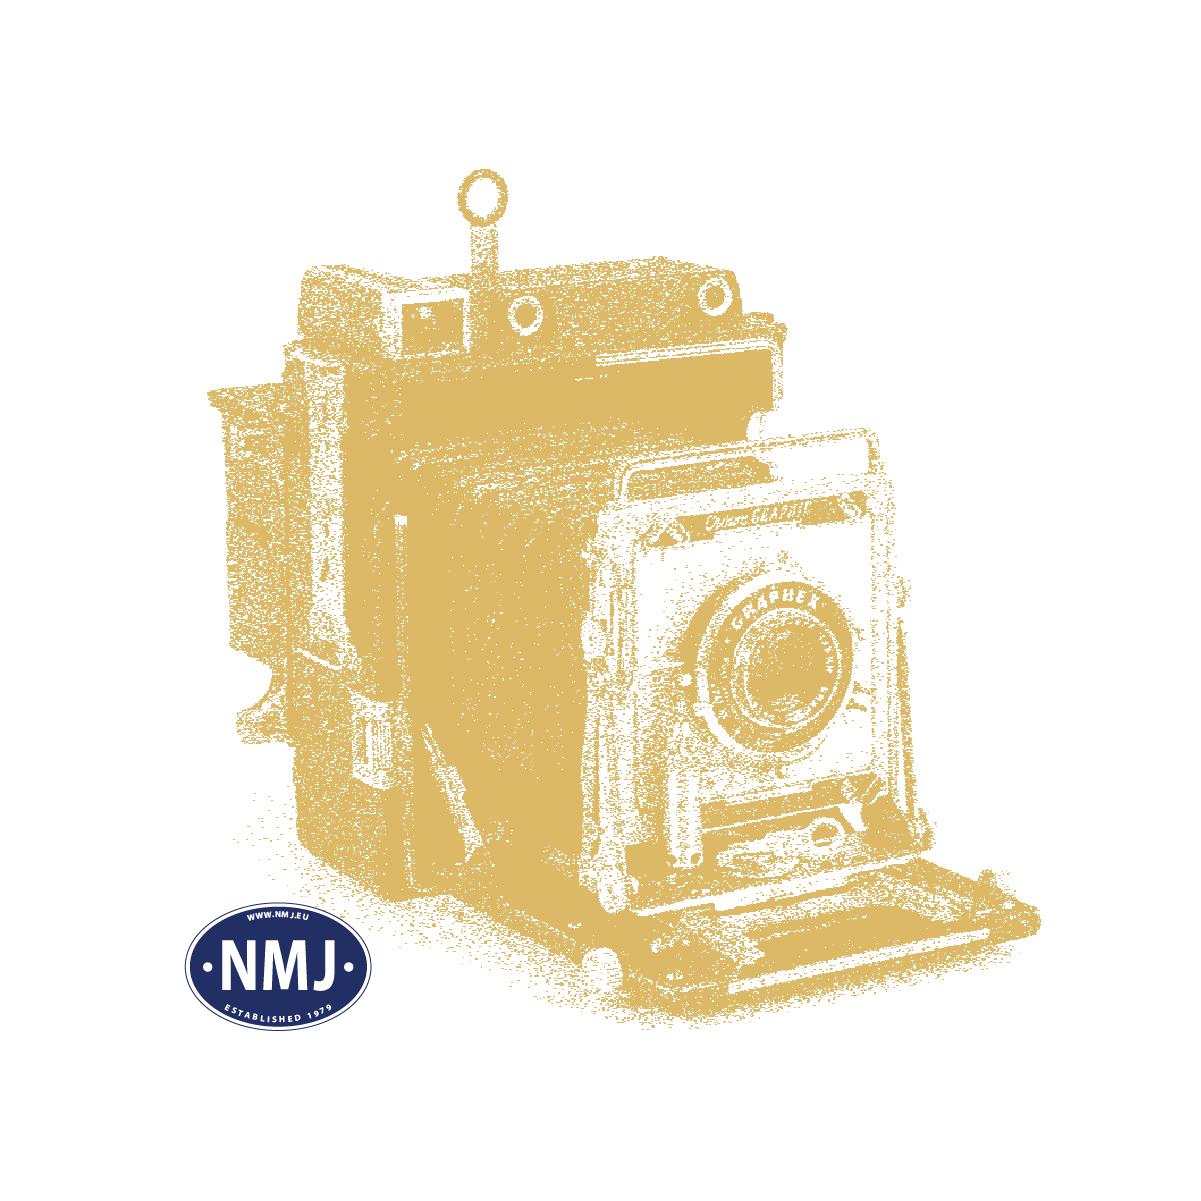 NMJT87.401 - NMJ Topline NSB El11b.2146, Nydesign, DC